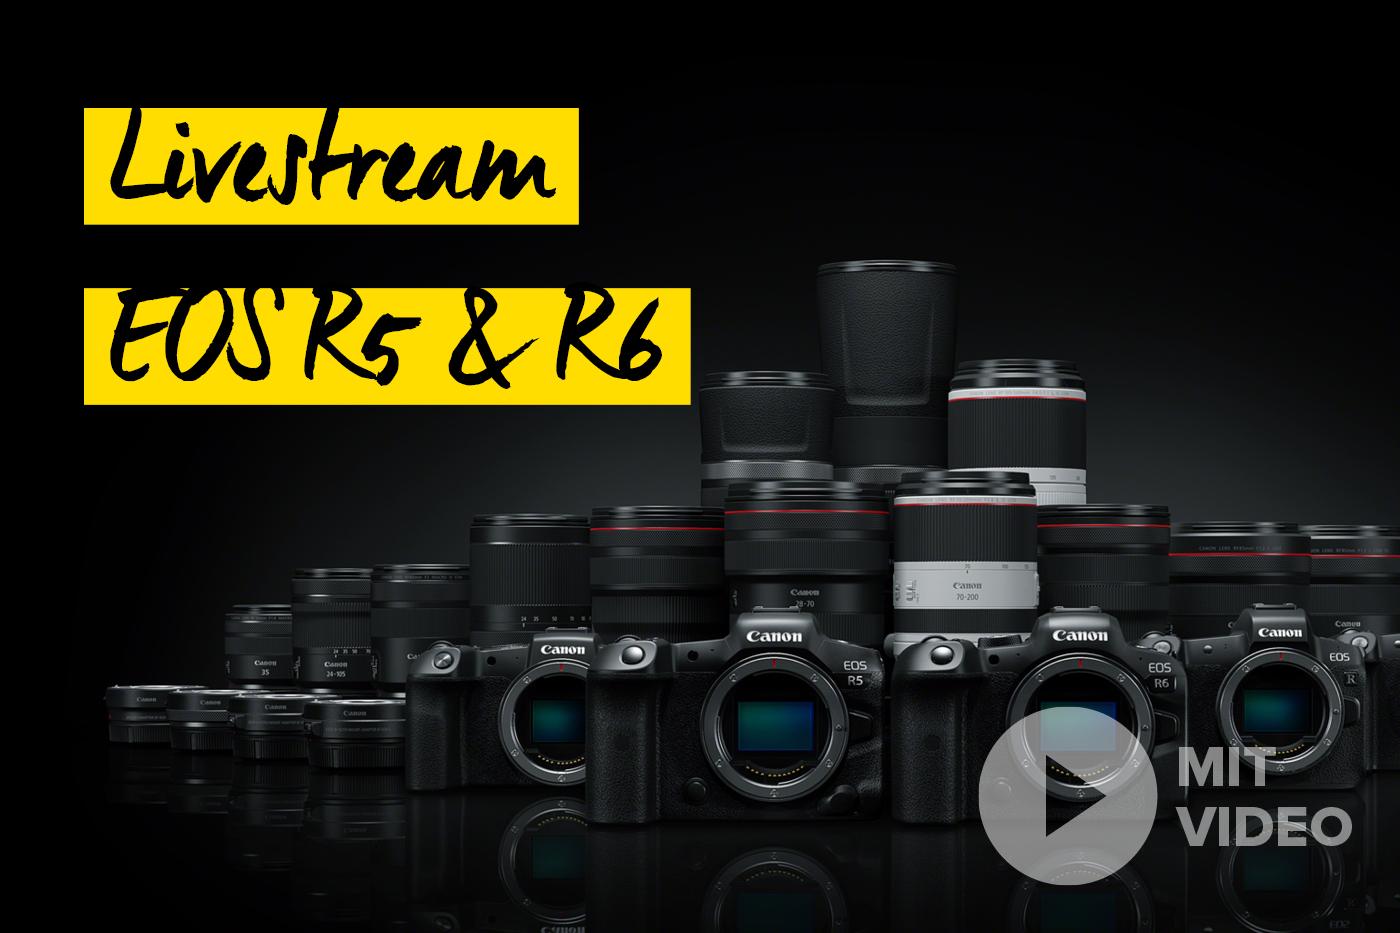 Canon EOS R5 Kamera und Objektive Livestream